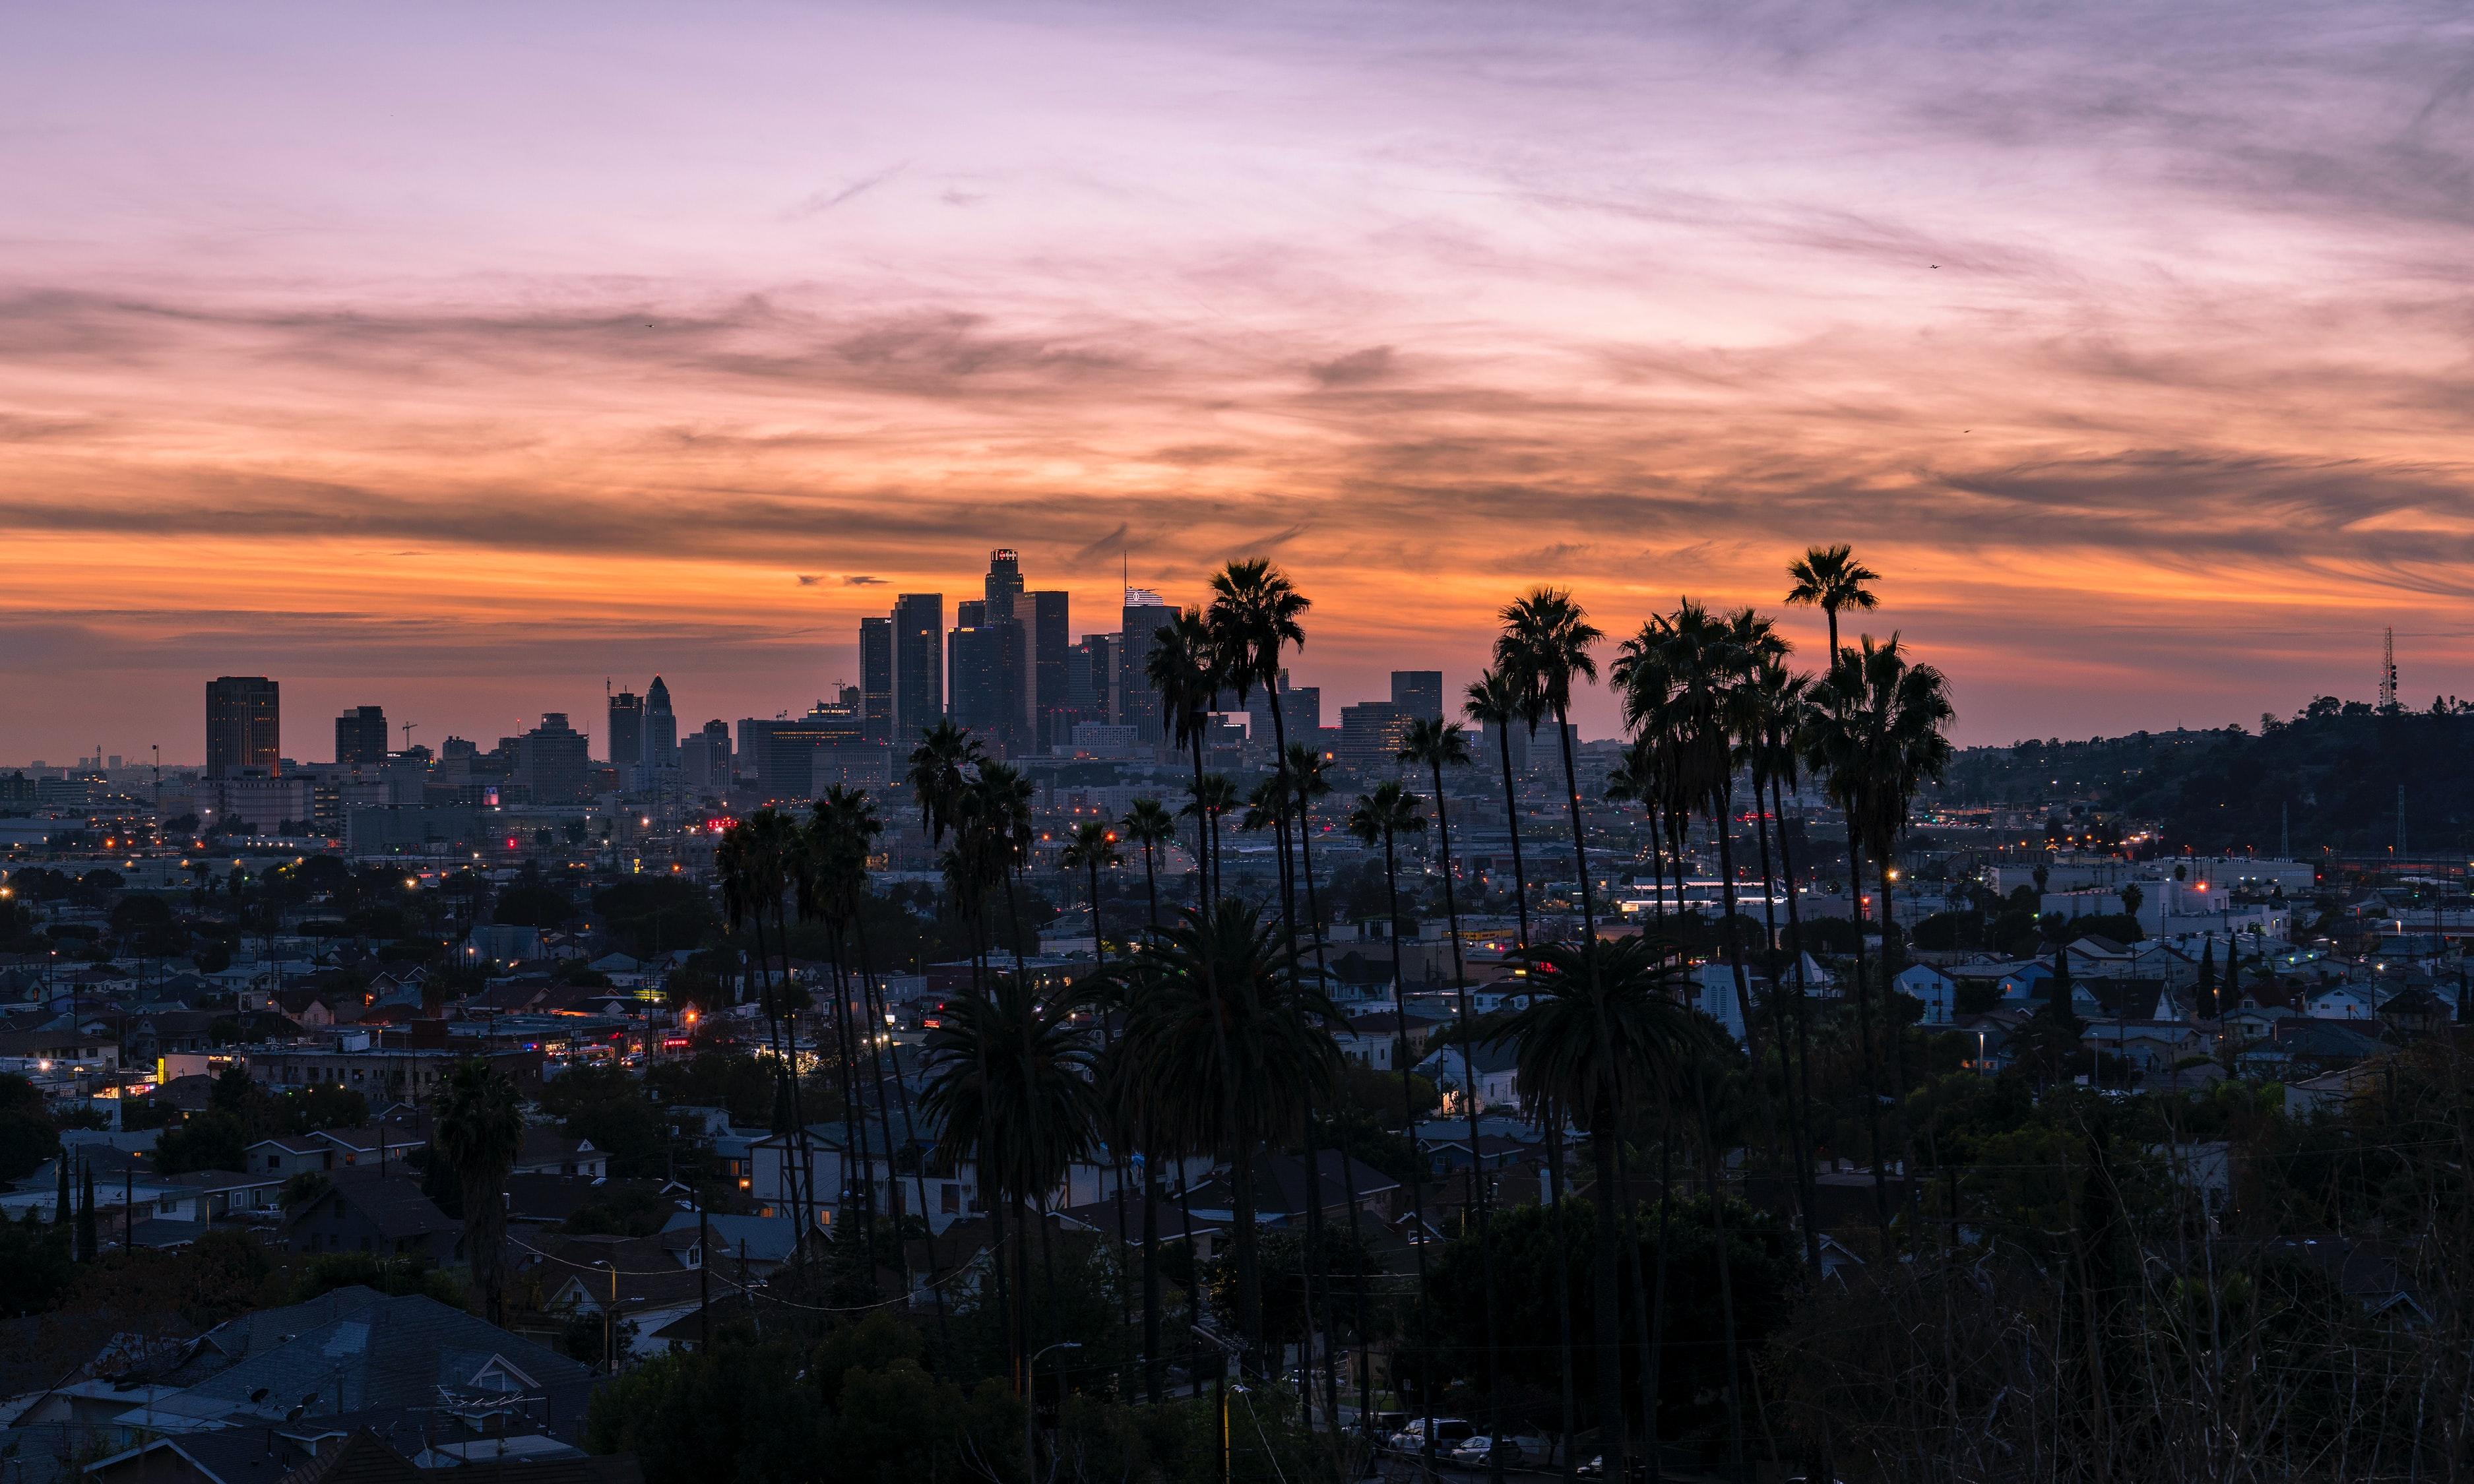 Los Angeles skyline at sunset dusk